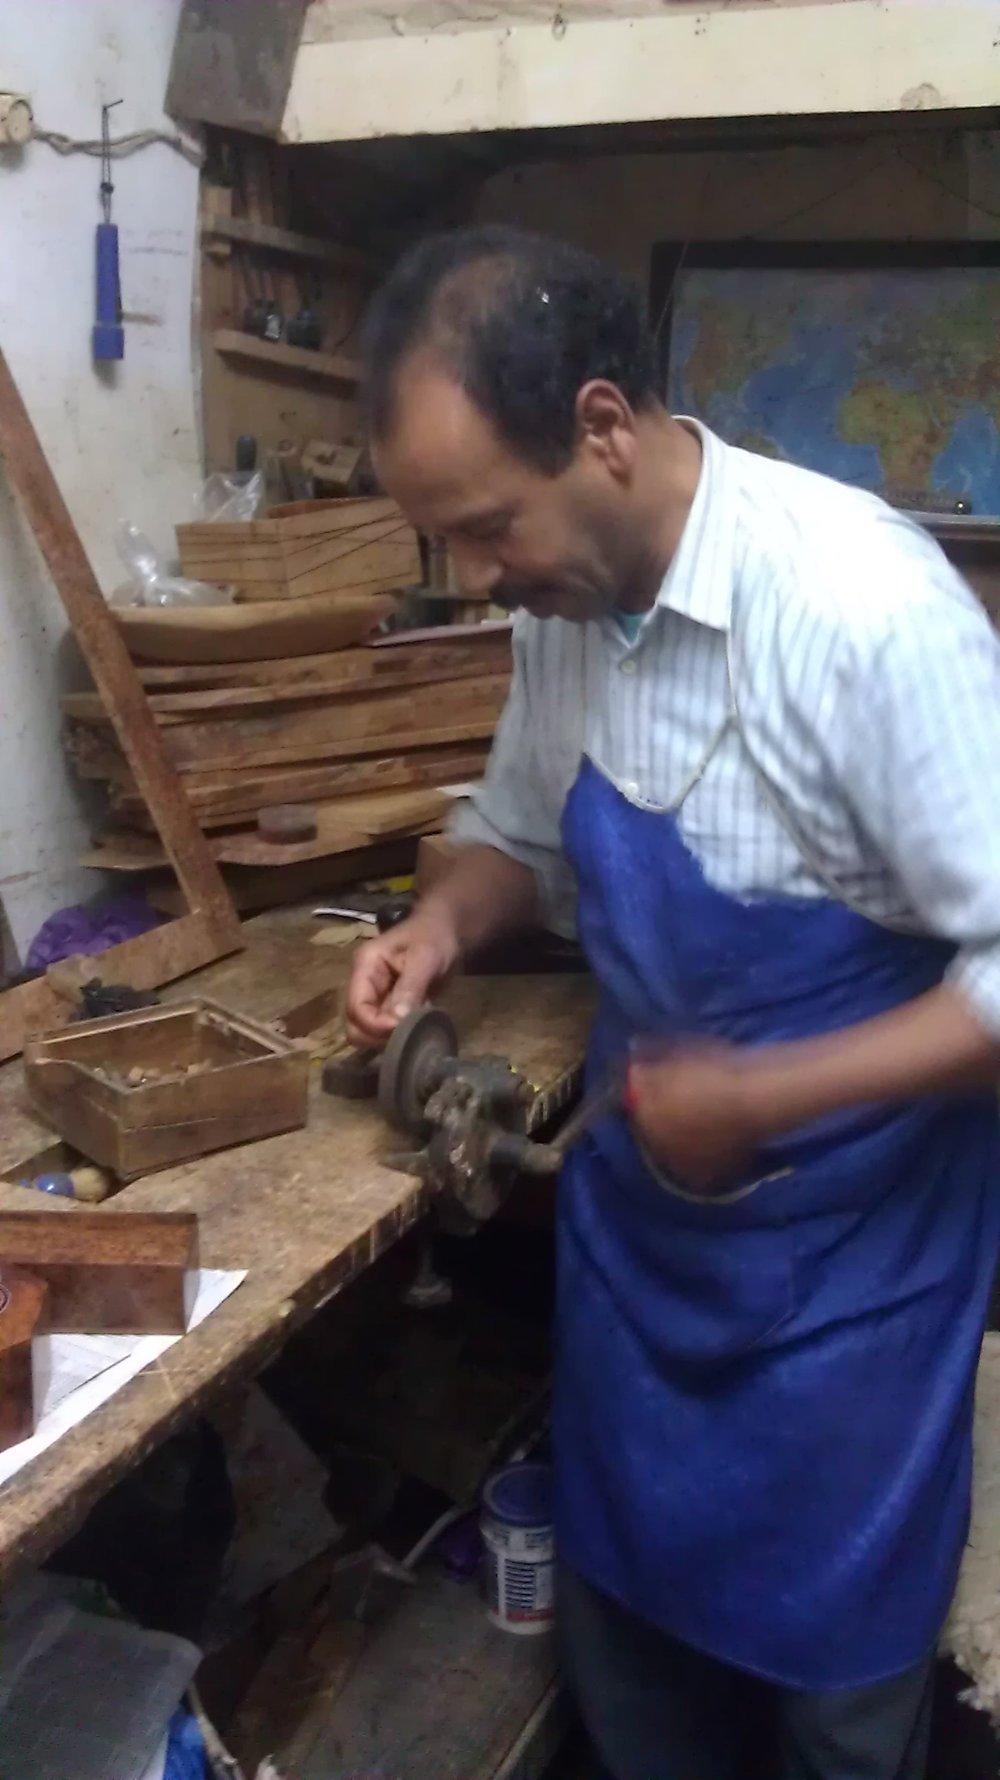 Woodworker-in-Essouira-Morocco.jpg